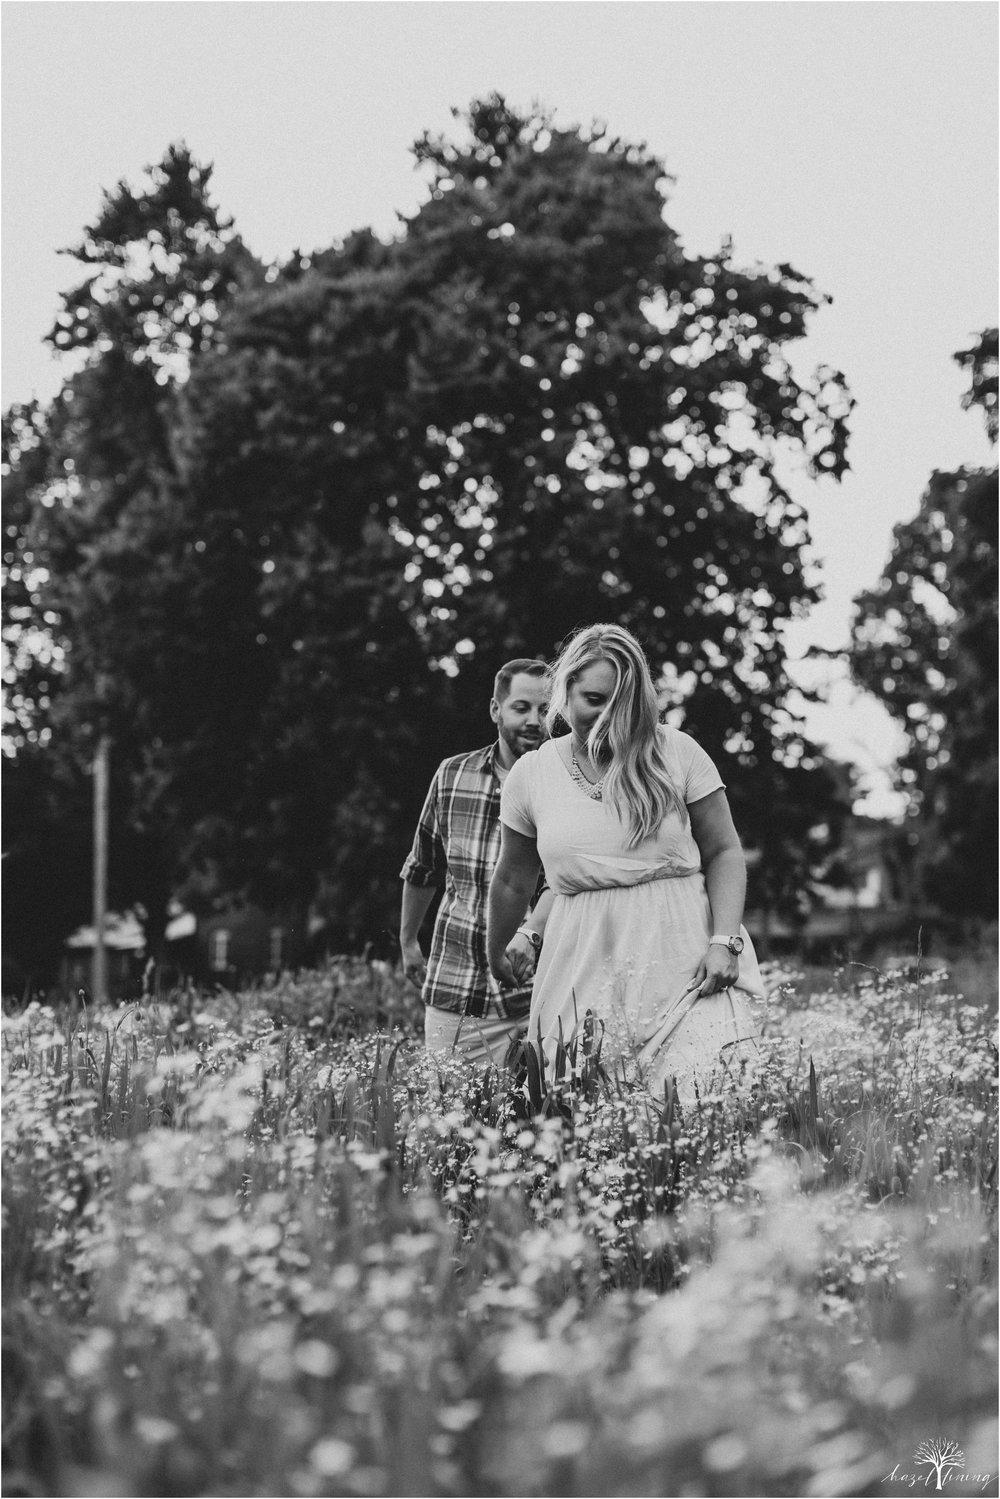 mel-mnich-john-butler-marietta-furnace-engagement-session-lancaster-county-pennsylvania-hazel-lining-travel-wedding-elopement-photography_0247.jpg